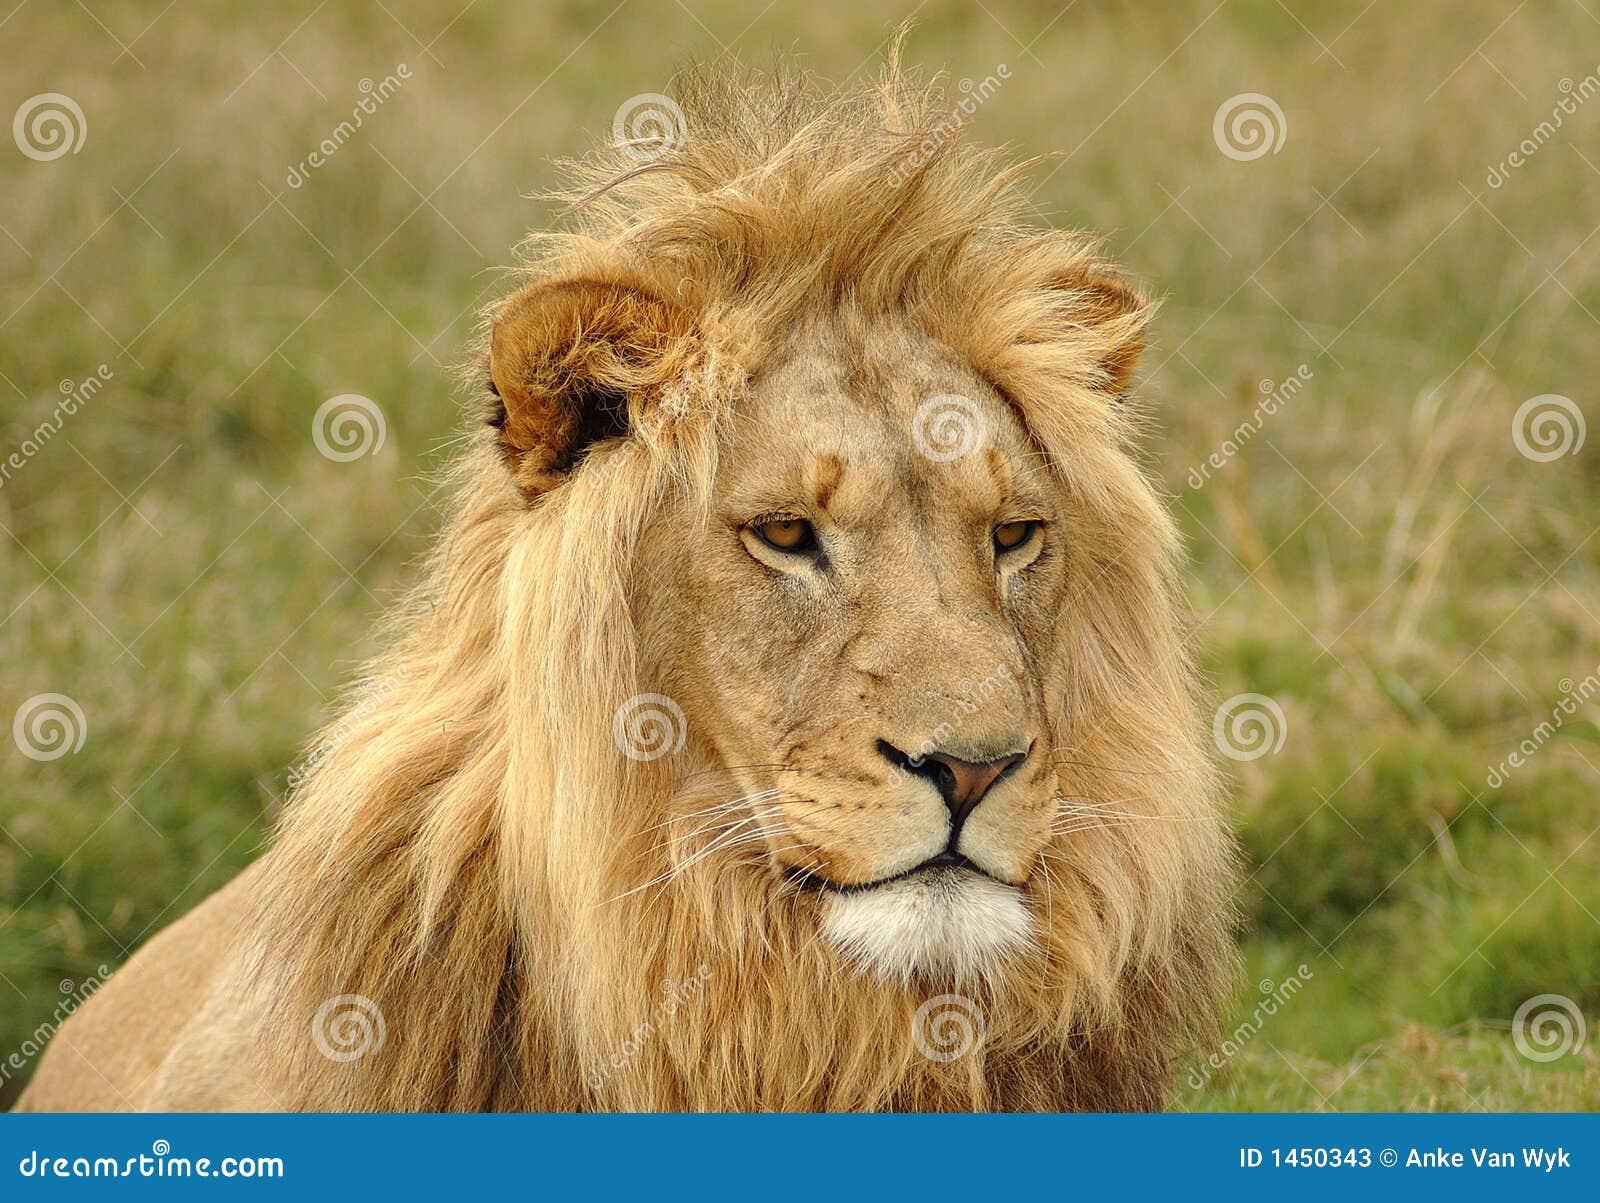 Lion head - photo#21